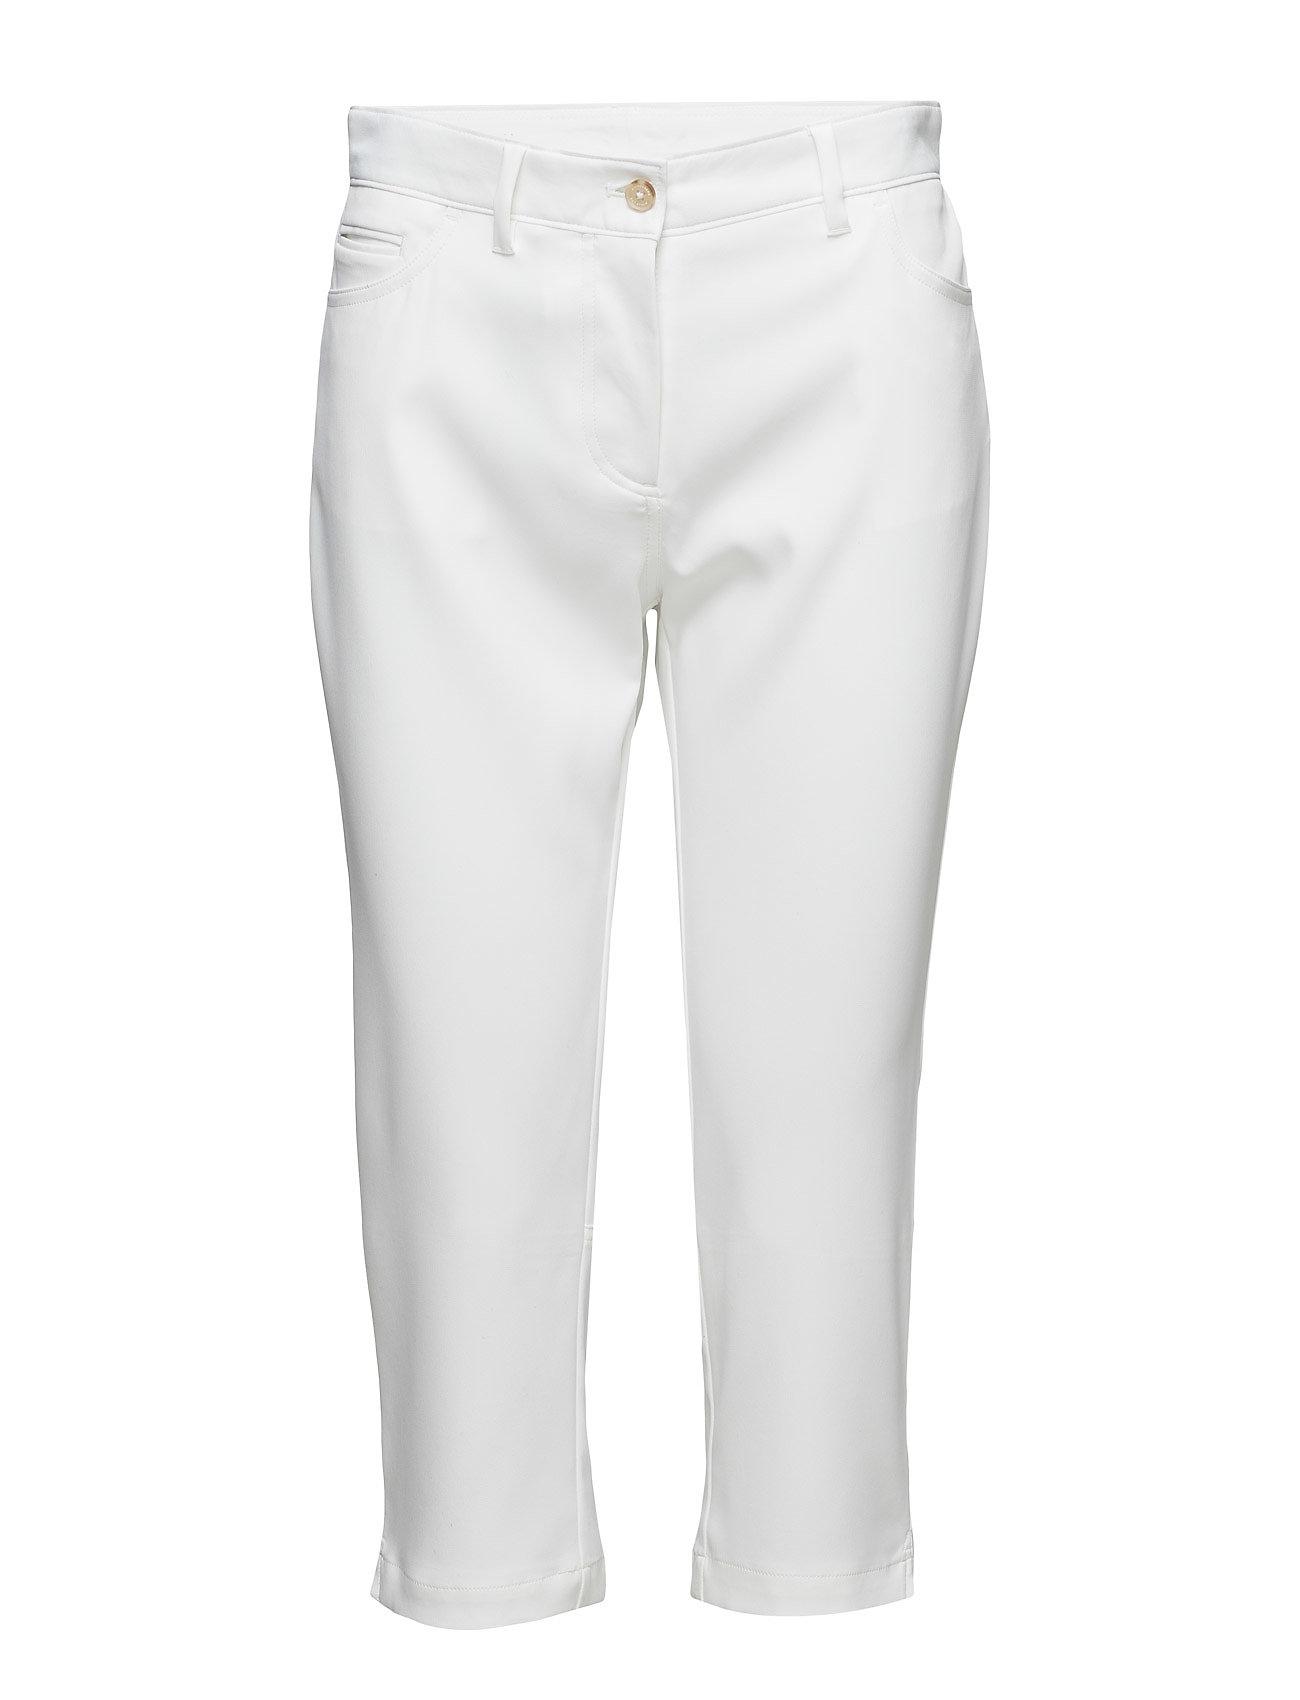 W Jeana Micro Stretch J. Lindeberg Golf Golf bukser til Damer i